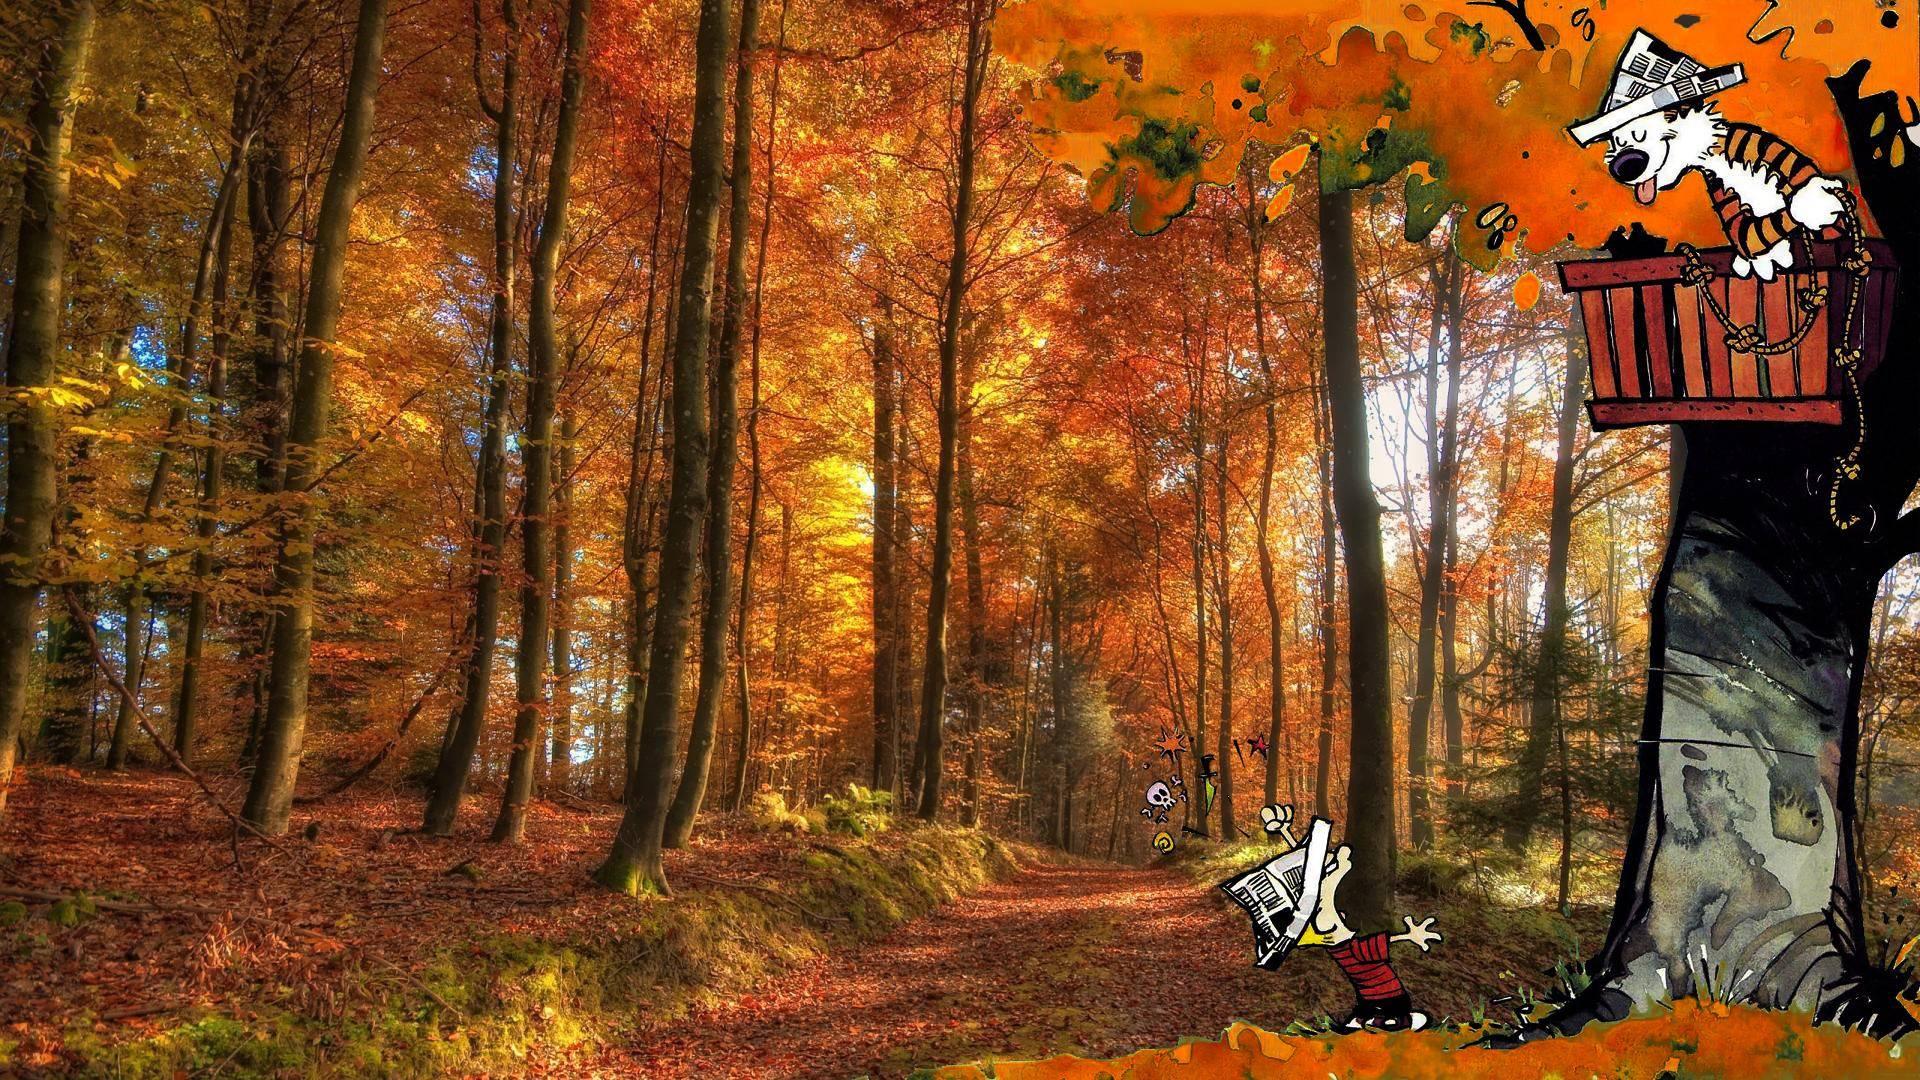 Calvin And Hobbes Fall Wallpaper Calvin And Hobbes Comics Autumn Forest Wallpaper